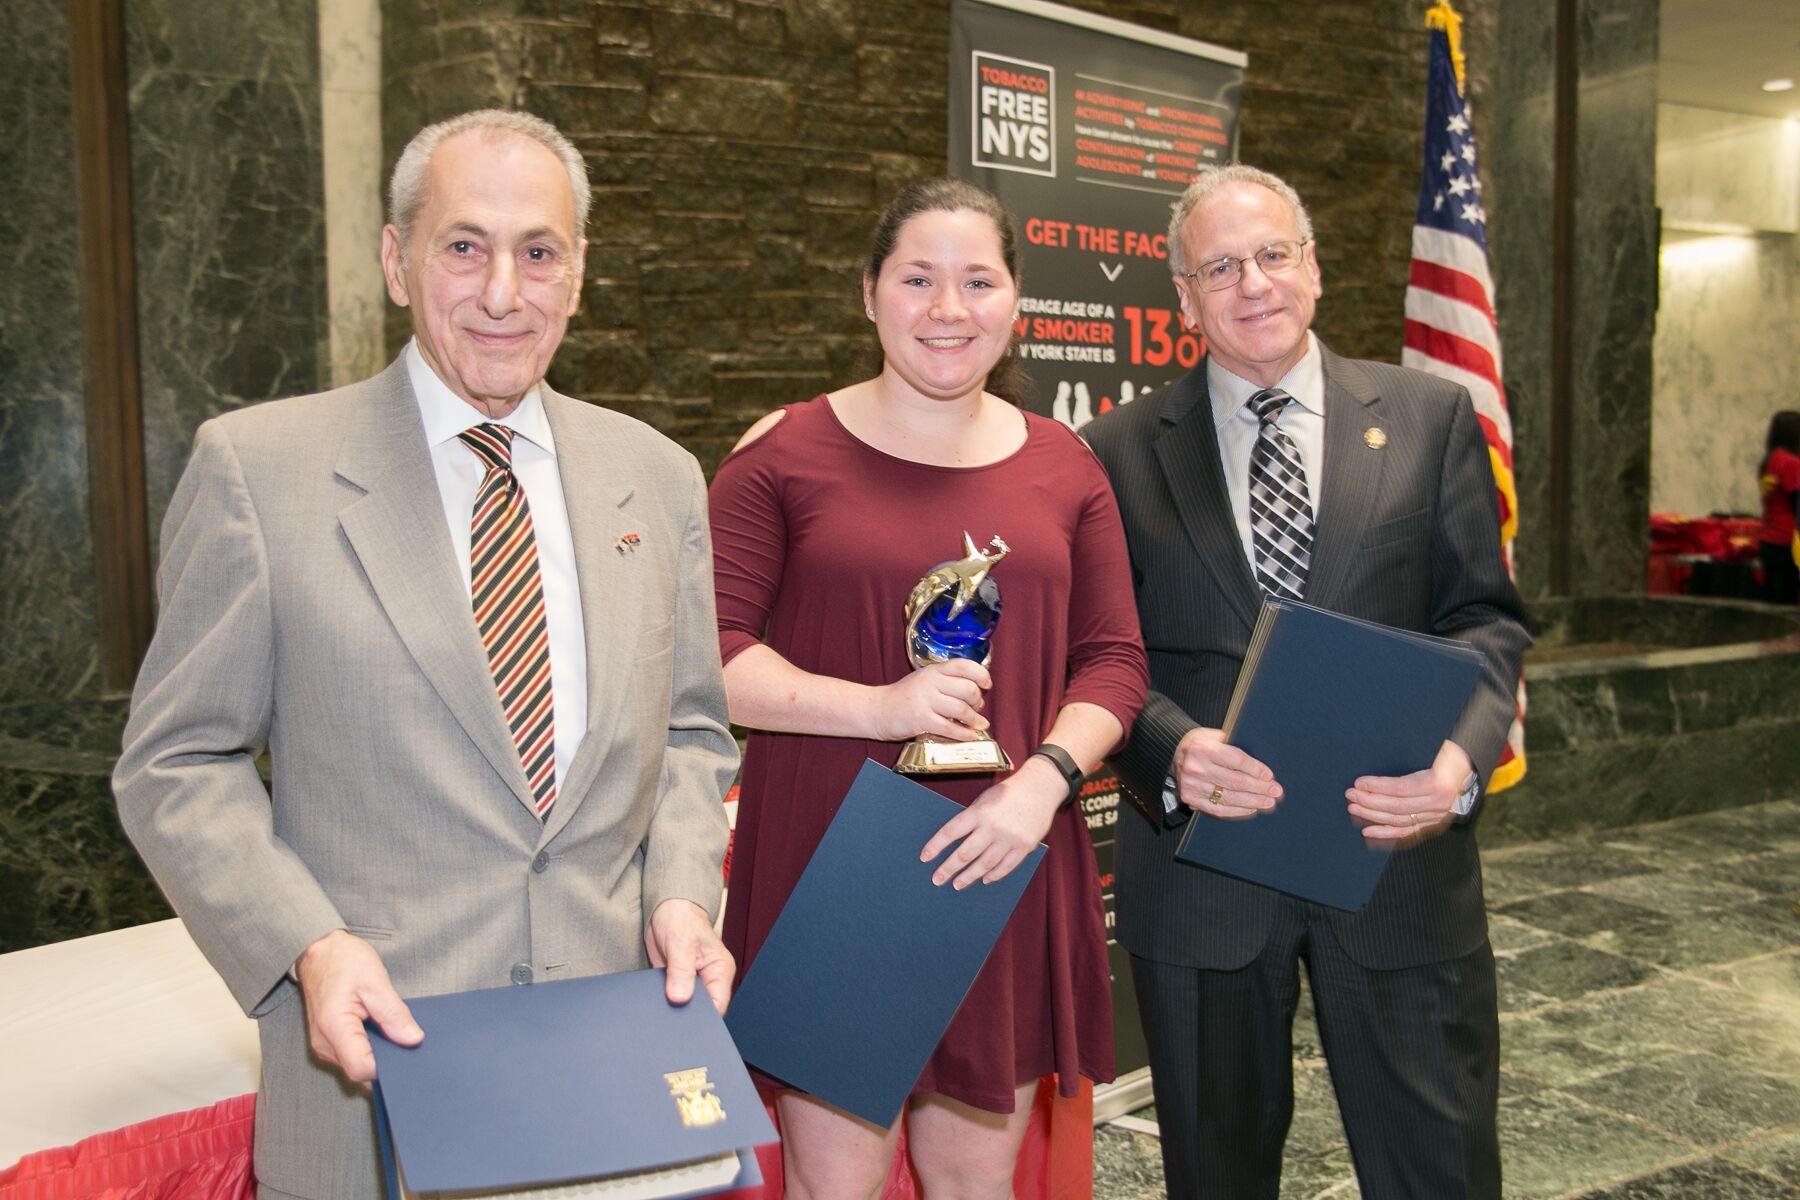 - Youth Advocate of the Year Award Lauren Cybul with Assemblyman Joseph Errigo and Assemblyman Jeffrey Dinowitz